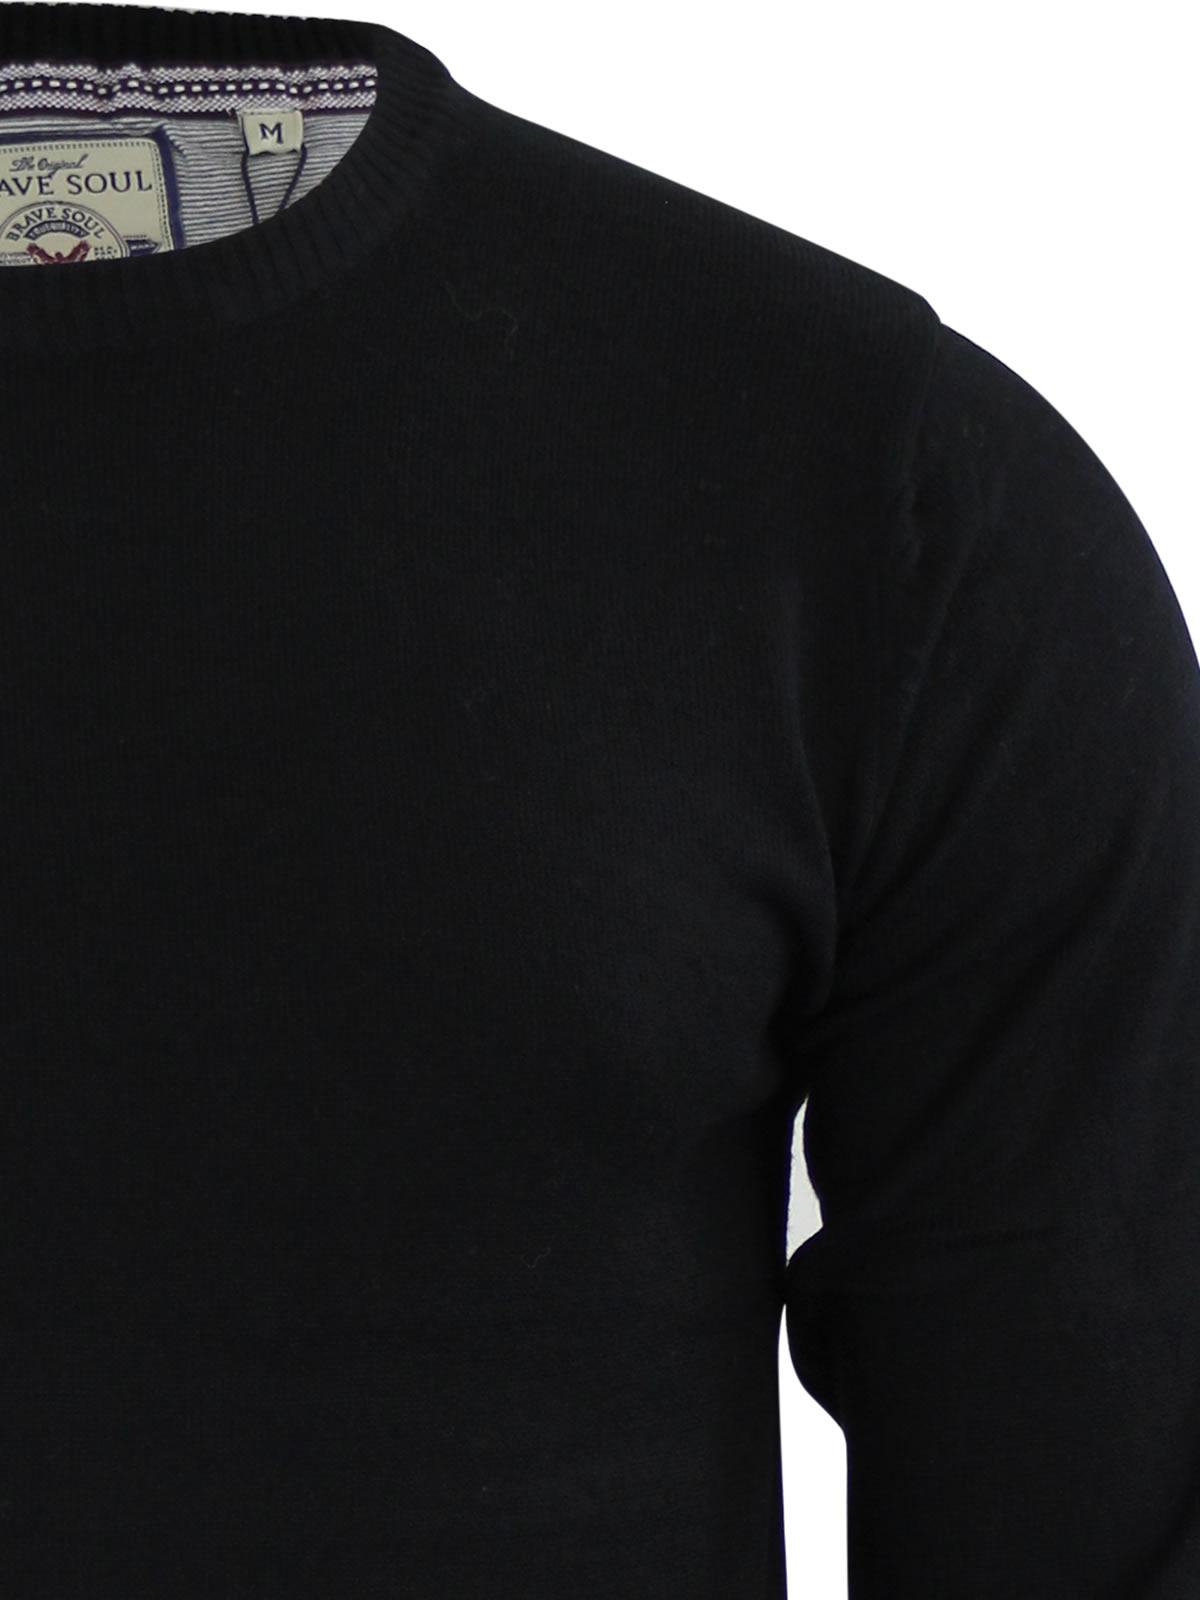 Mens-Jumper-Brave-Soul-Urbain-Knitted-Crew-Neck-Sweater thumbnail 4